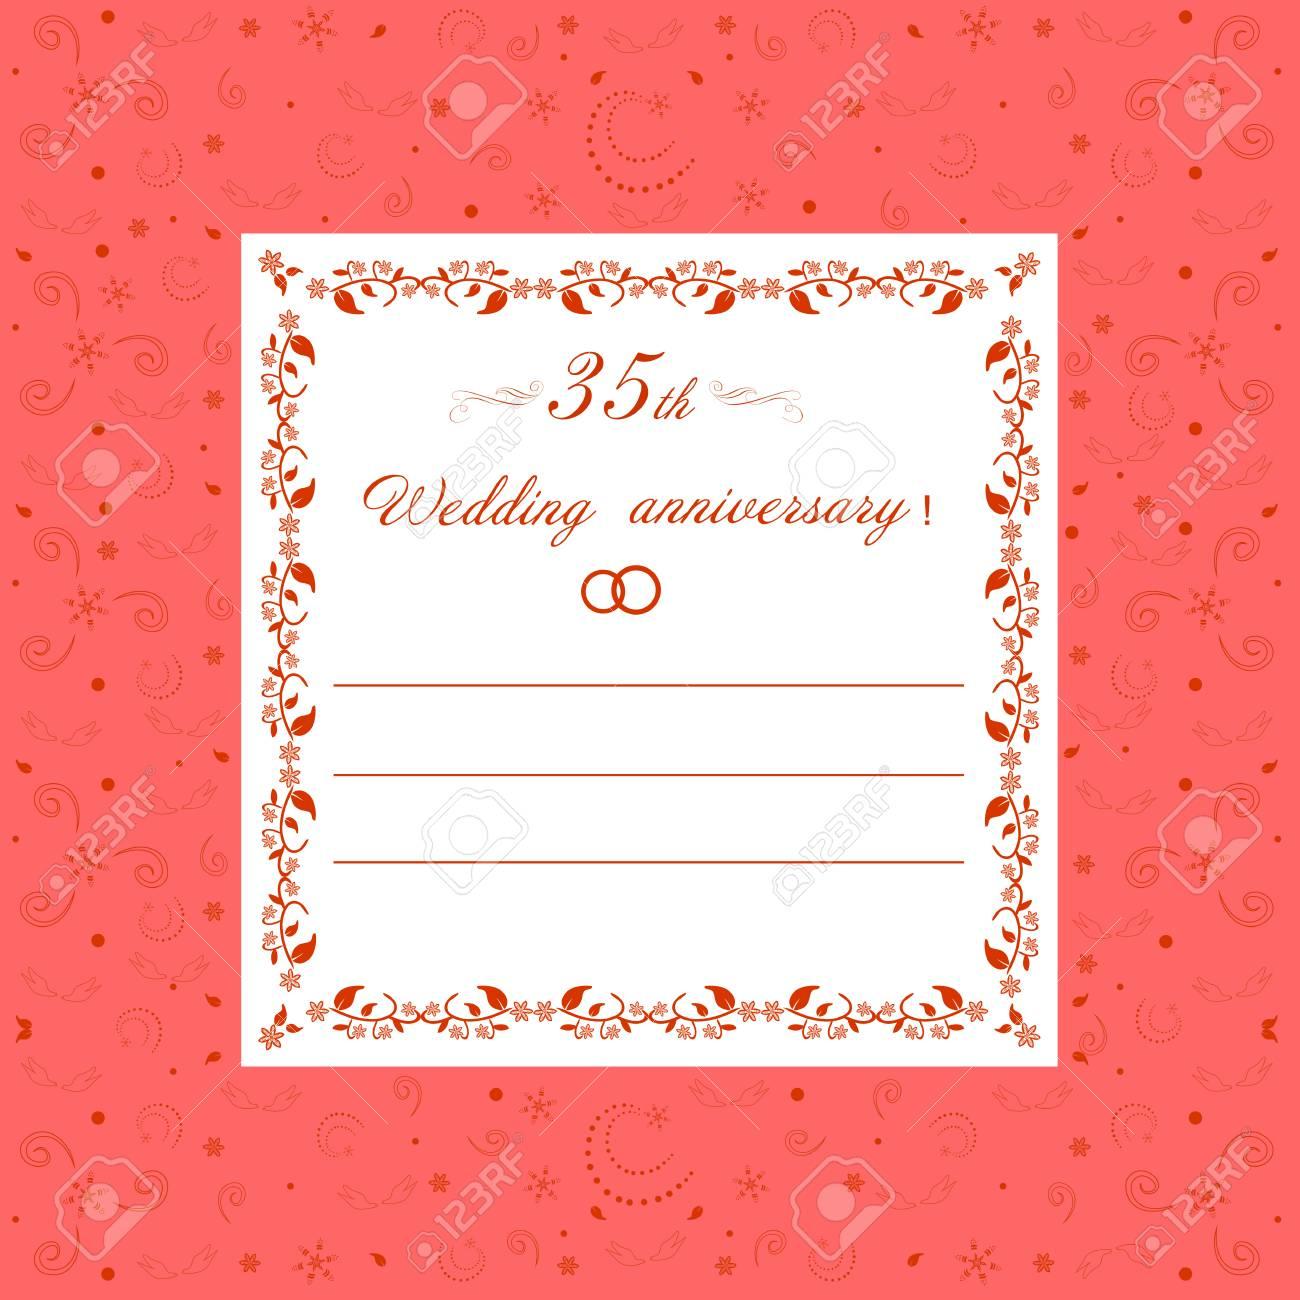 35th wedding anniversary invitationral wedding romance editable 35th wedding anniversary invitationral wedding romance editable vector illustration stock vector 92043949 stopboris Image collections